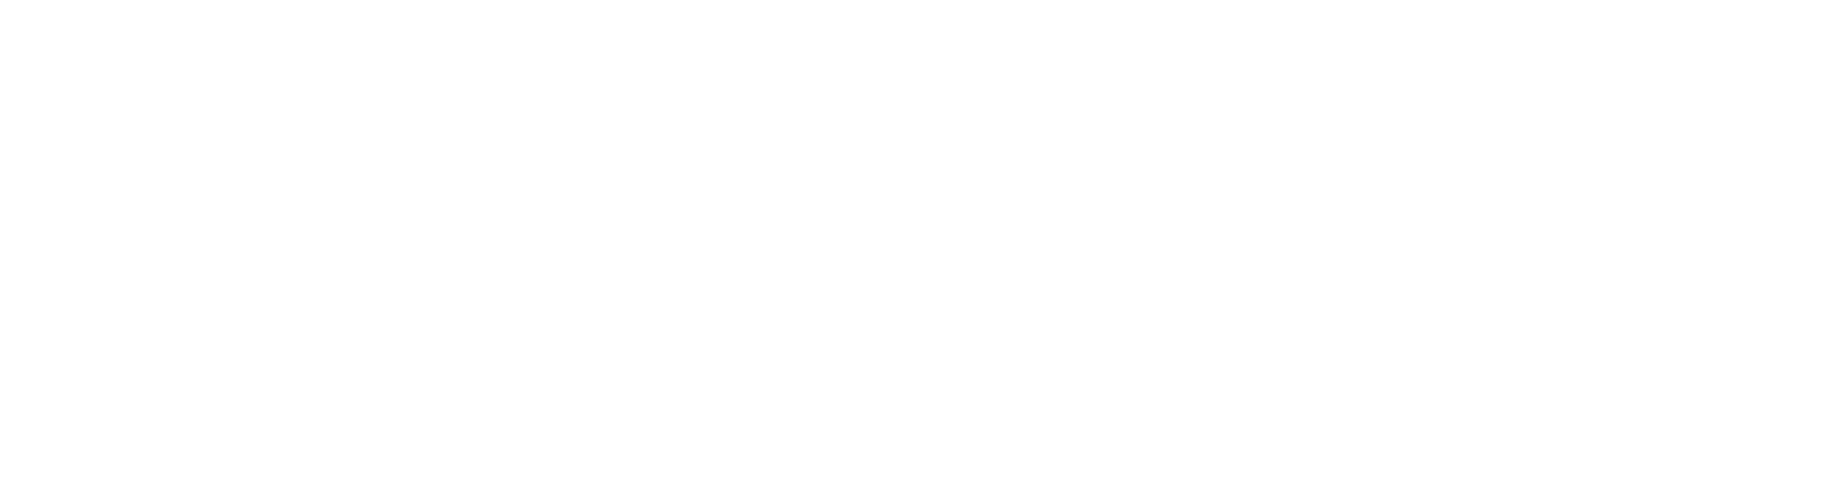 hachette-audio logo